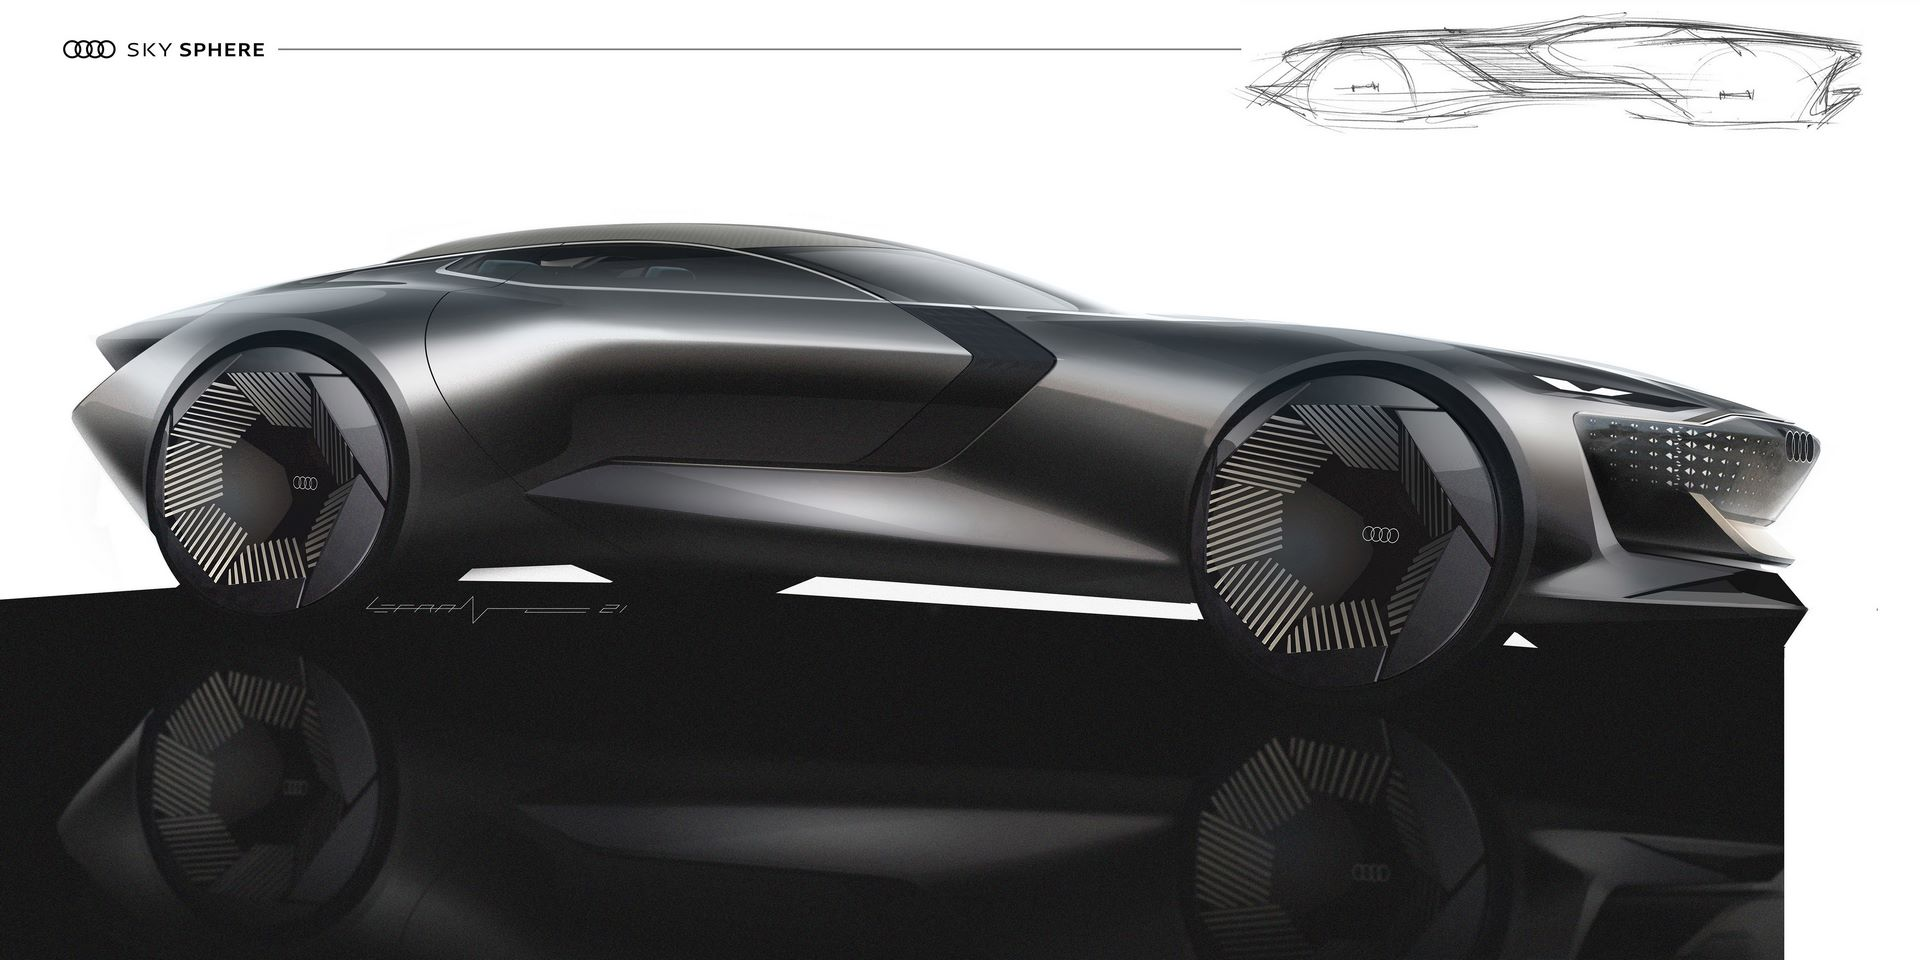 Audi-Skysphere-Concept-35